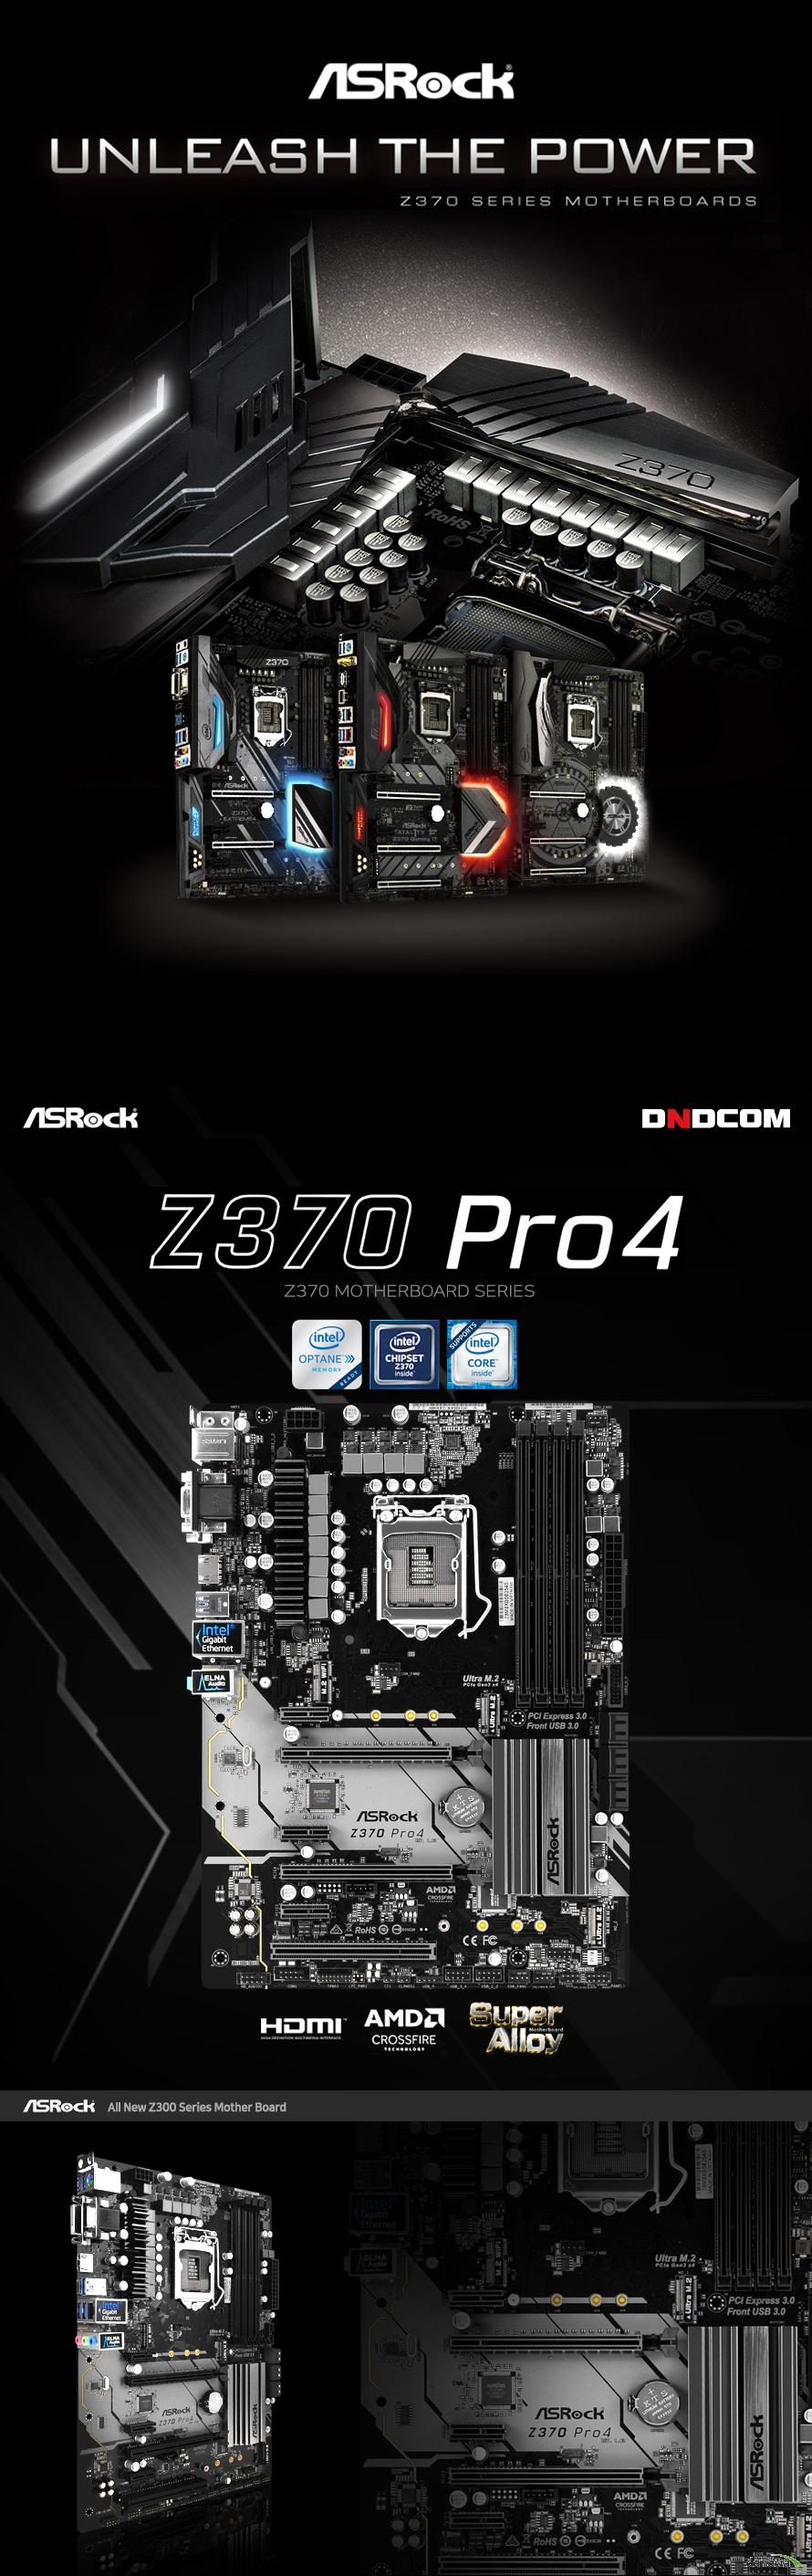 unleash the powerASRock z370 pro4 디앤디컴